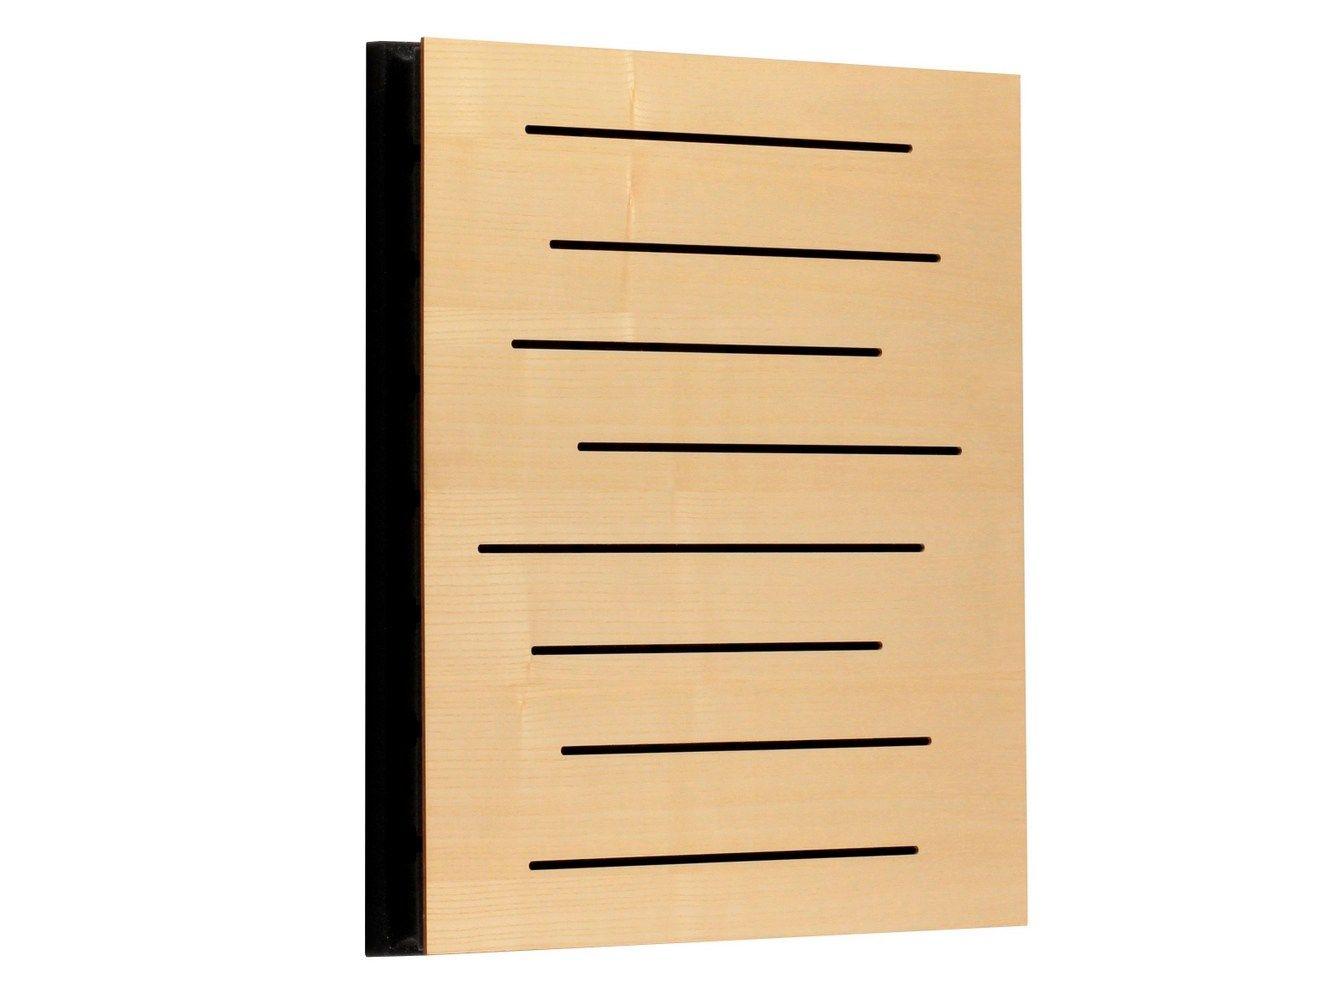 Mdf decorative acoustical panels vari panel kit by for Decorative mdf